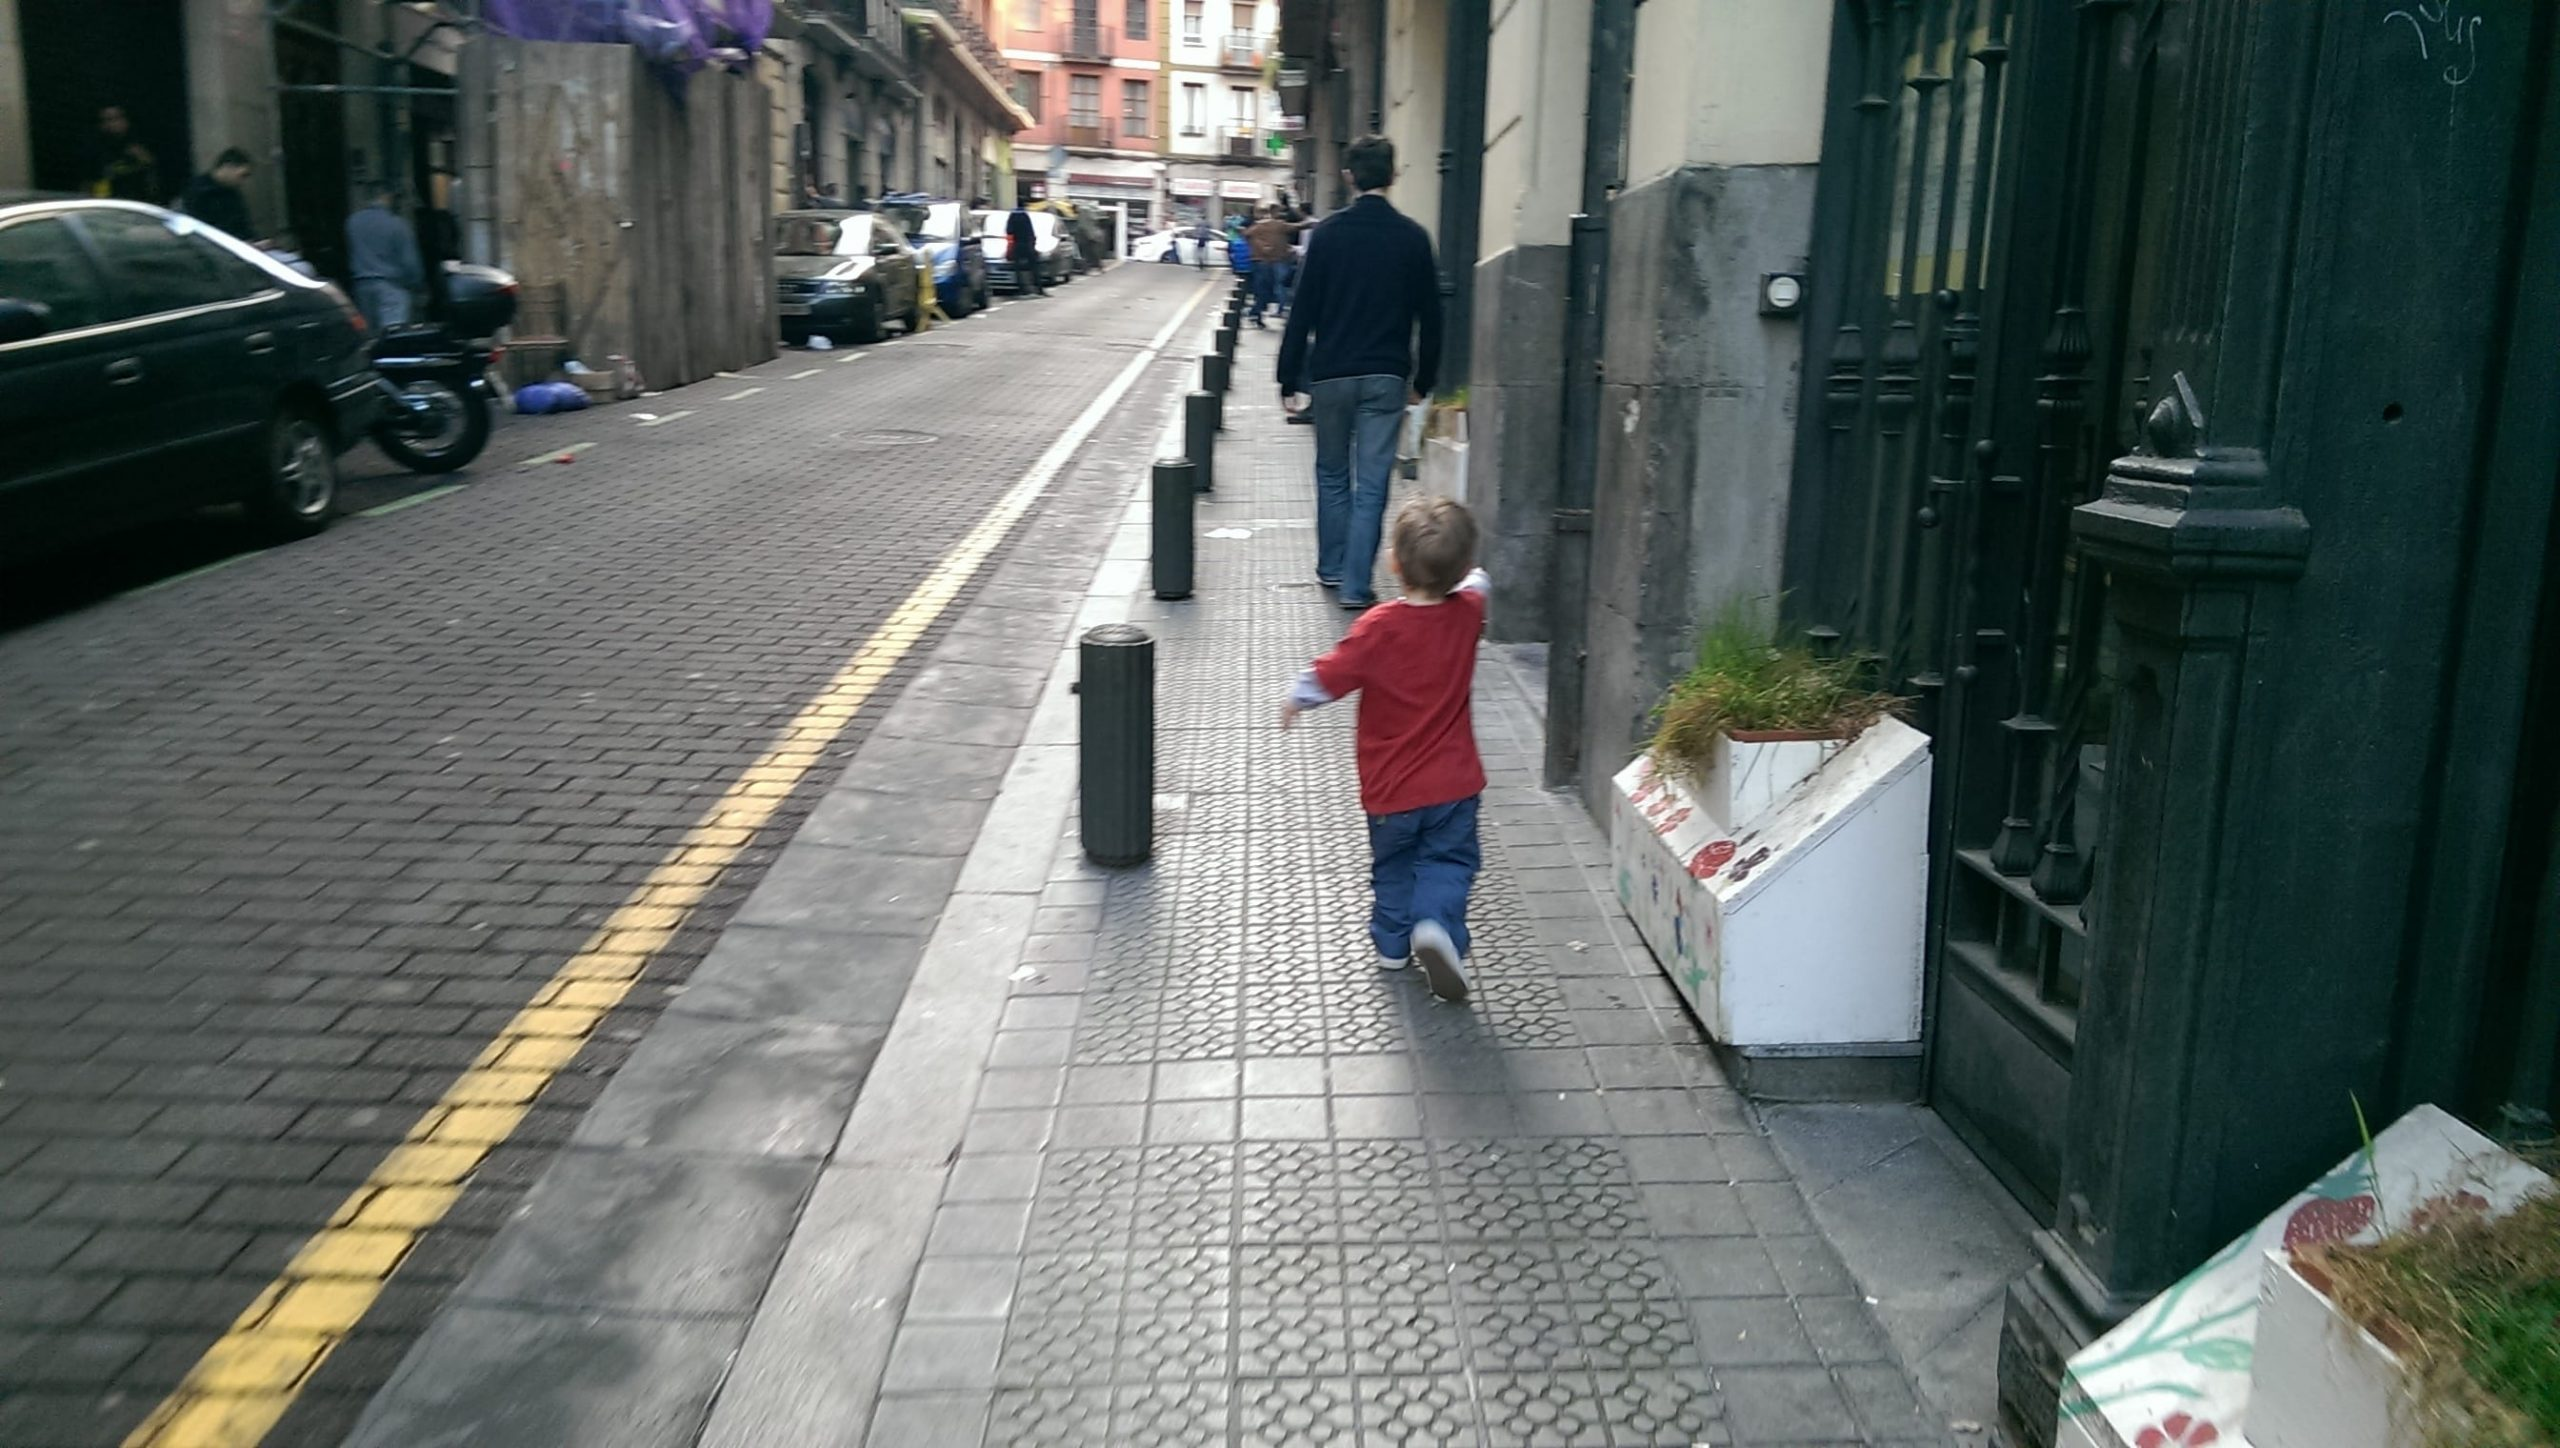 Bilbao streets